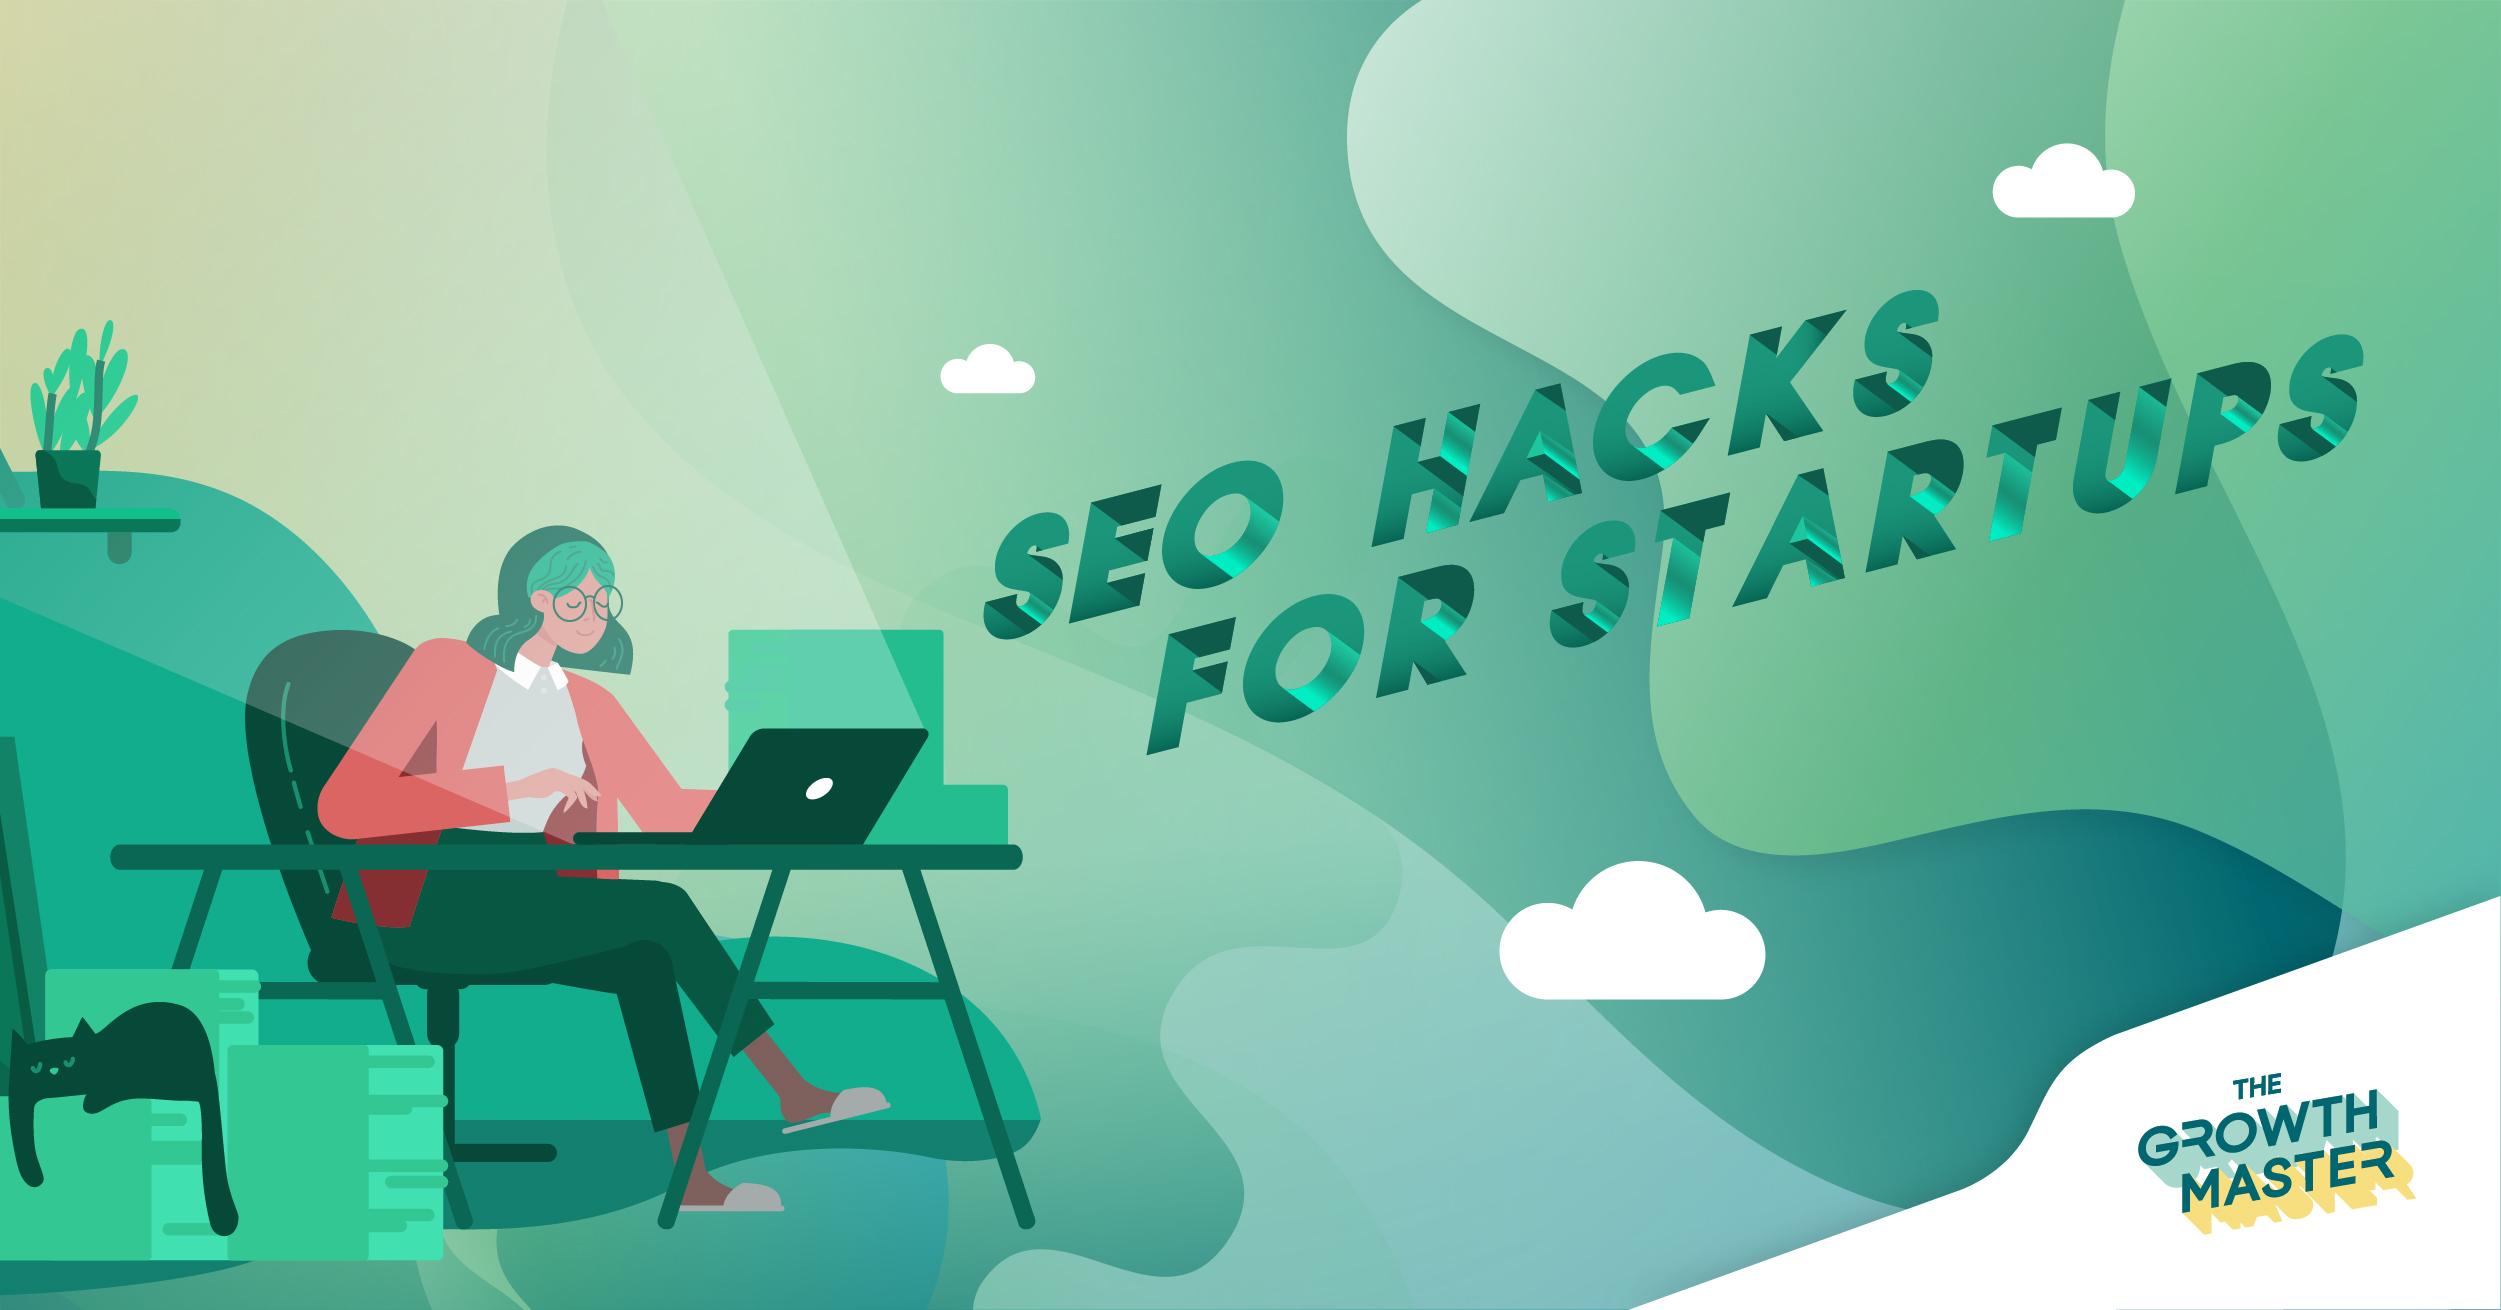 SEO Hacks for Startups: 8 เทคนิค SEO ทำน้อยได้มาก ไม่เปลืองงบ สำหรับสตาร์ทอัพ